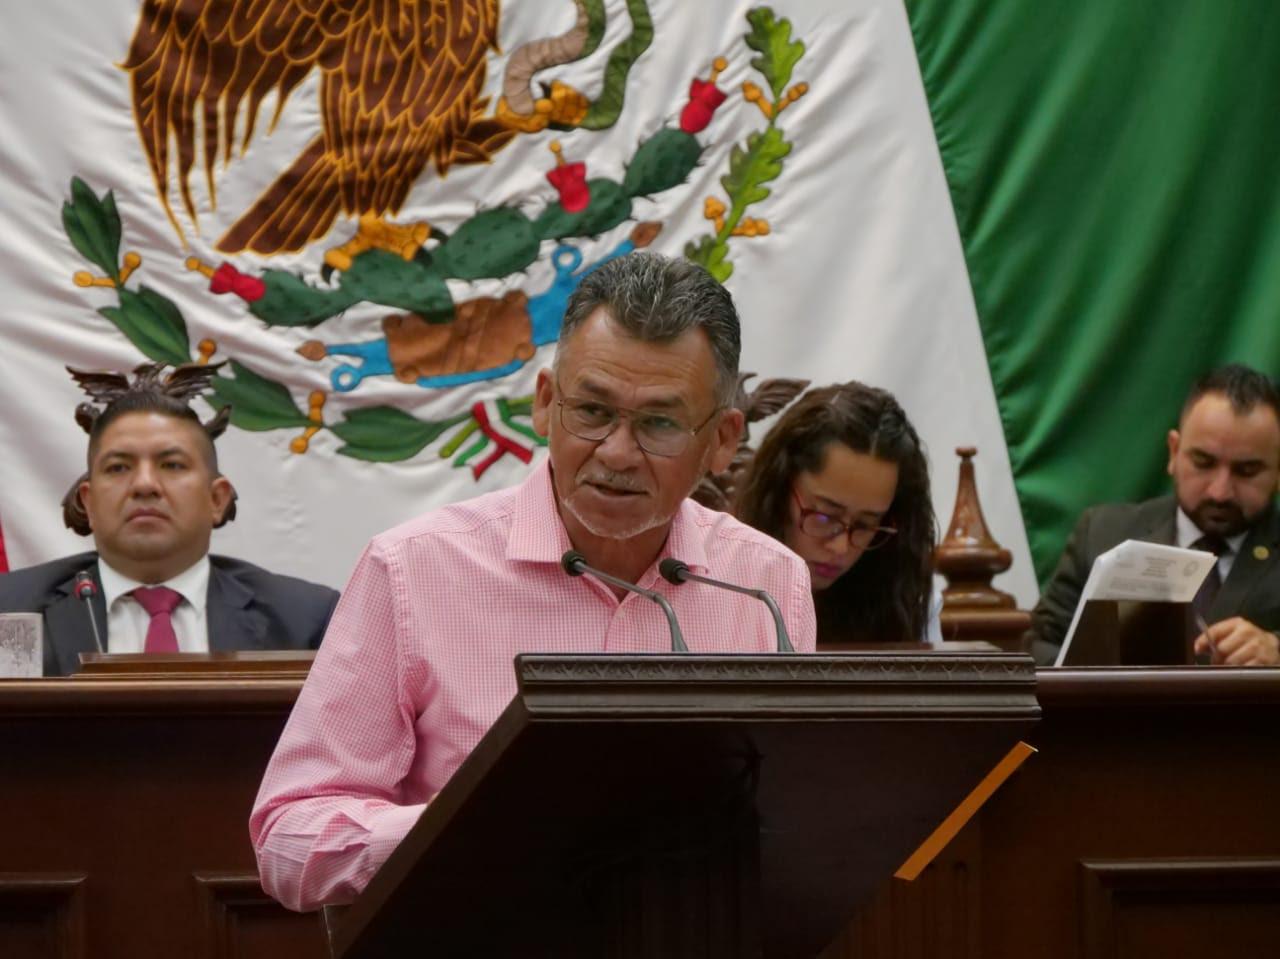 Regulación de partidos políticos en Michoacán, propone diputado Sergio Báez